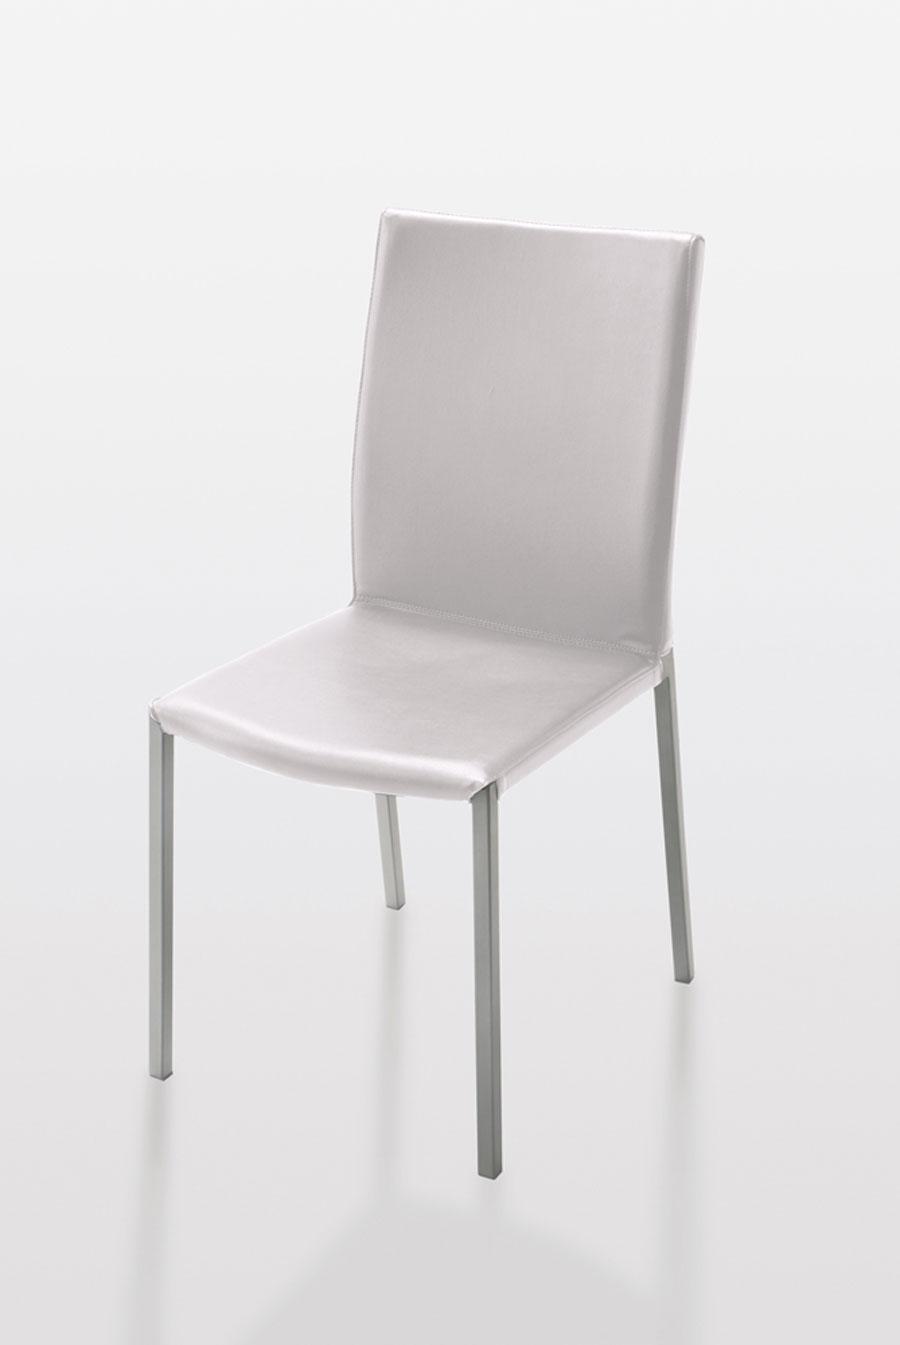 excellent sedie design moderno ecopelle bianca cucina bar salotto with sedie salotto